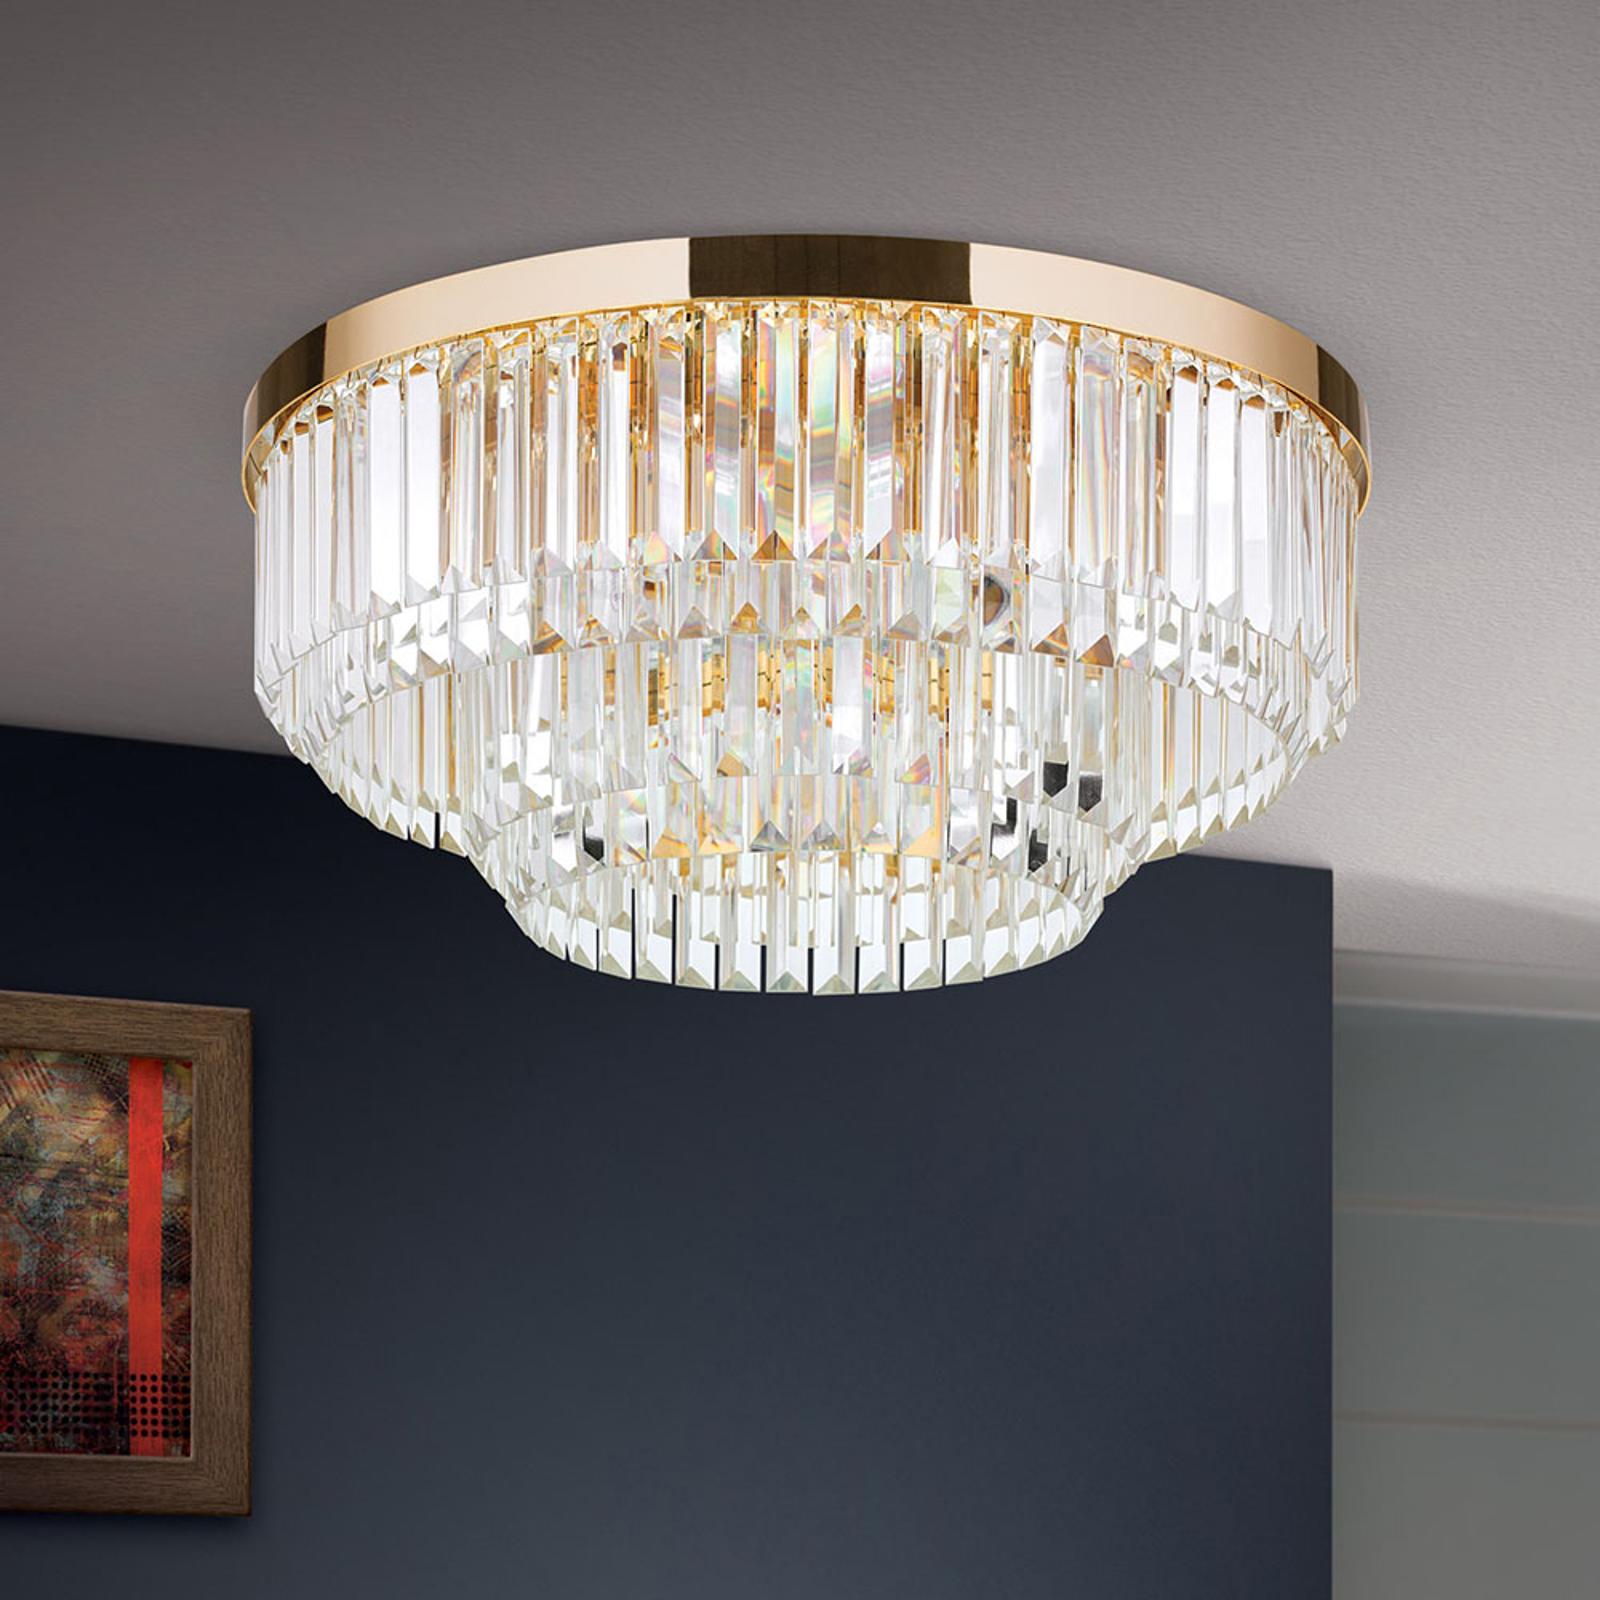 LED-kattovalaisin Prism, kulta, Ø 55 cm